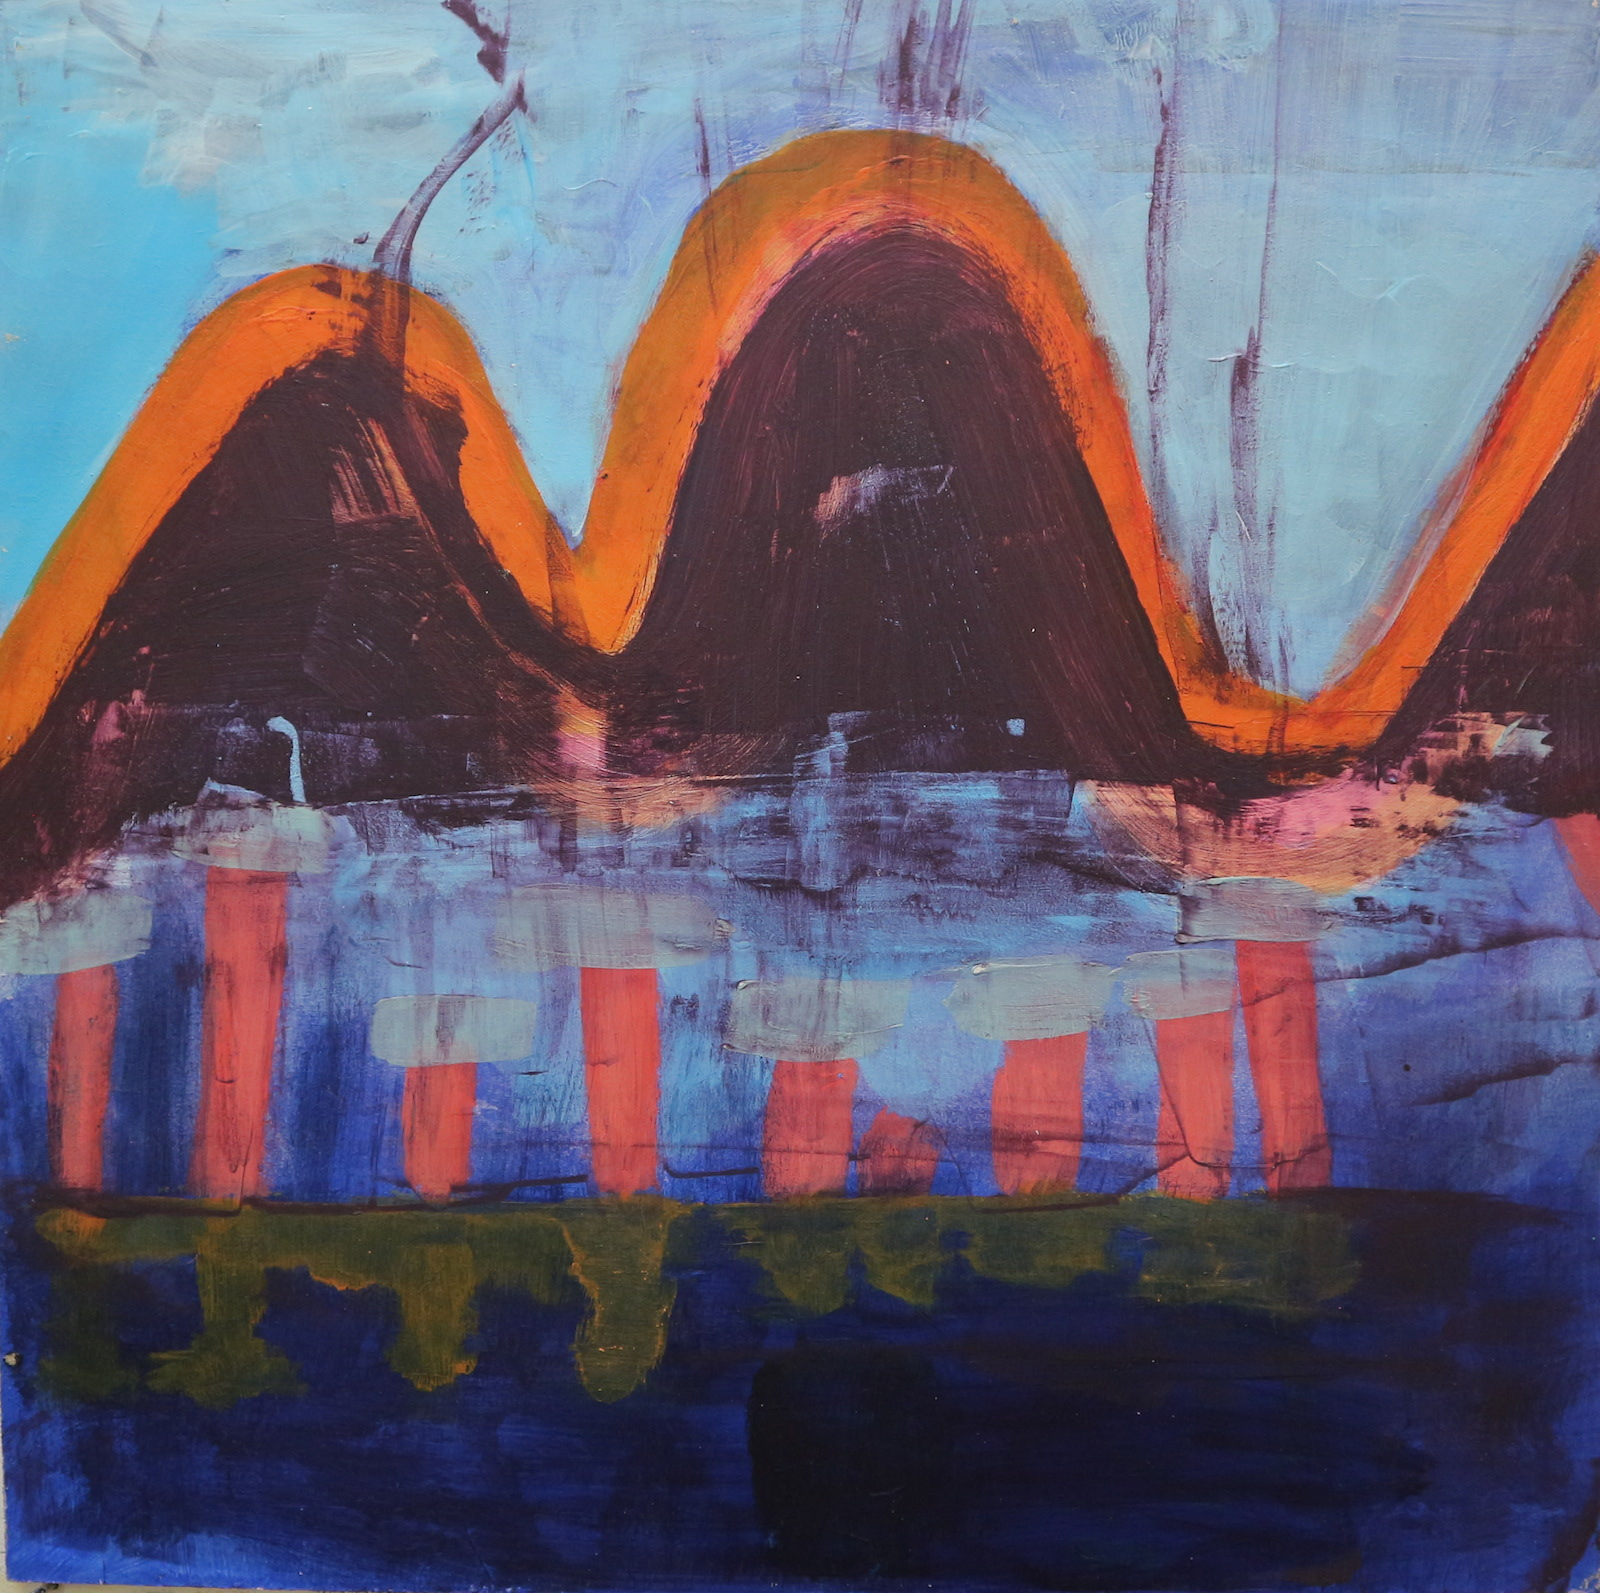 building bridges, 40 cm x 40 cm, acrylic on mdf, 2016, Jane Hughes